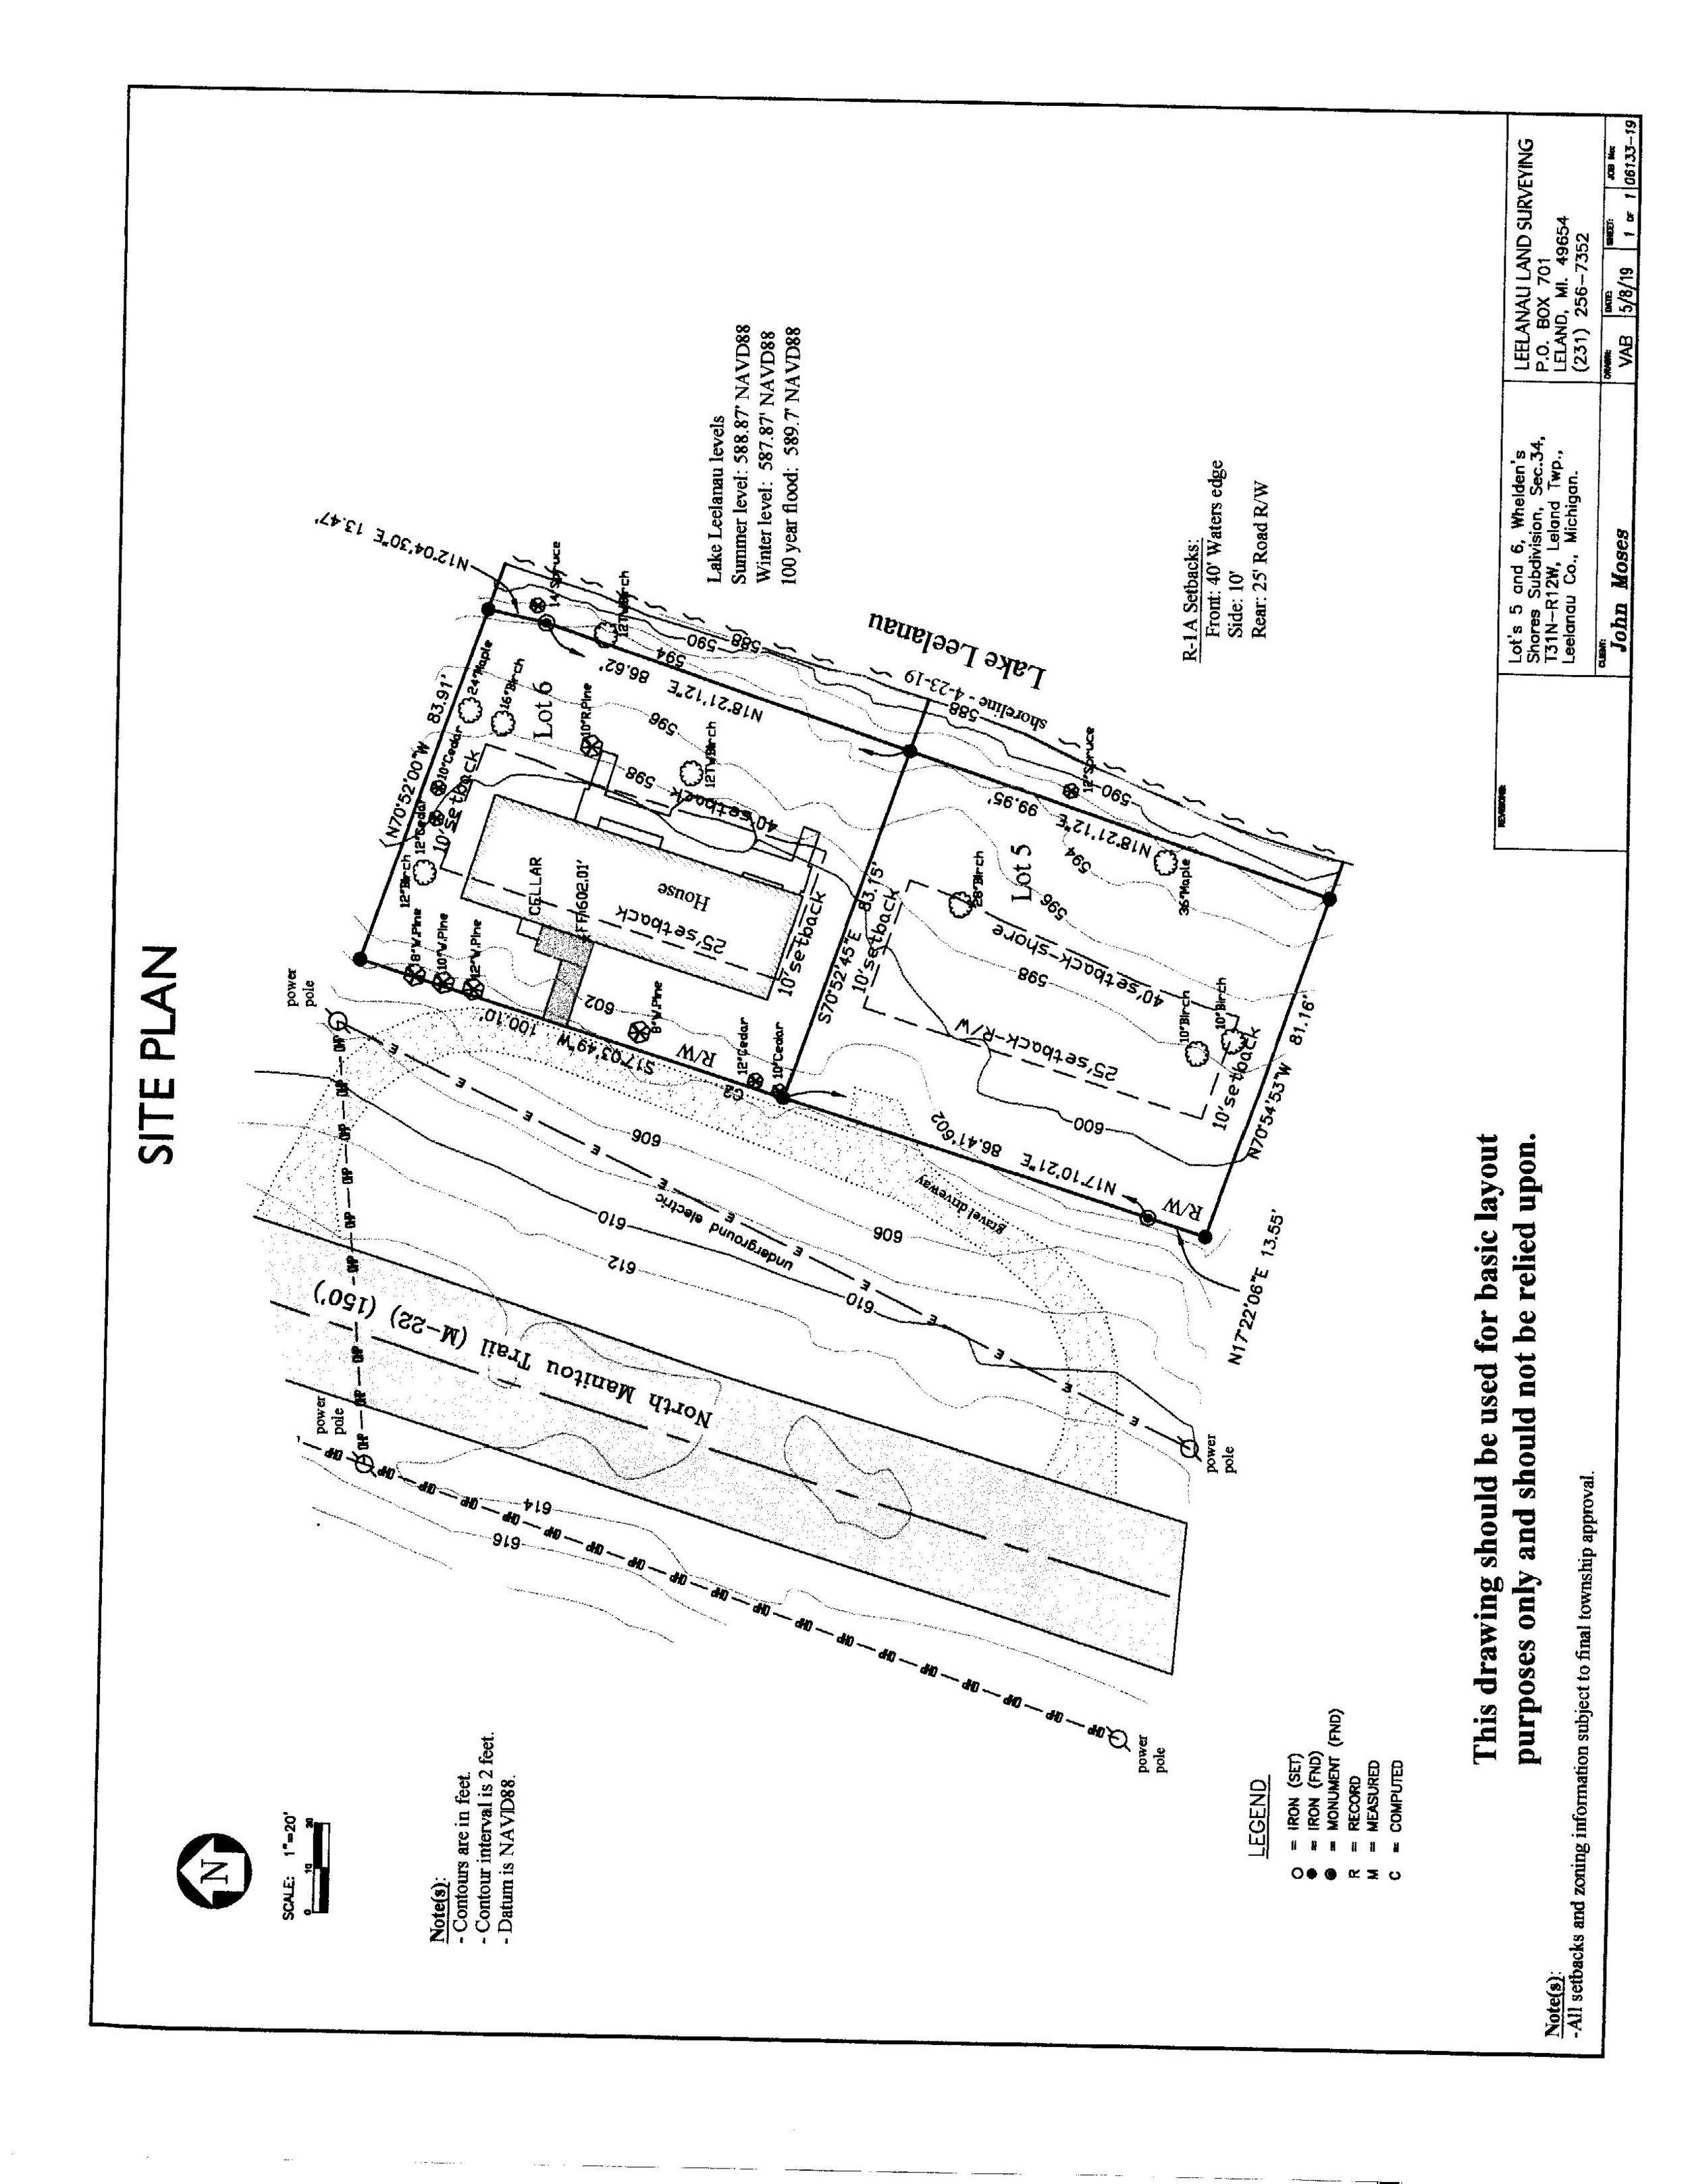 4388 N Manitou Trail, Leland - Marketing packet by Oltersdorf Realty LLC (15).jpg